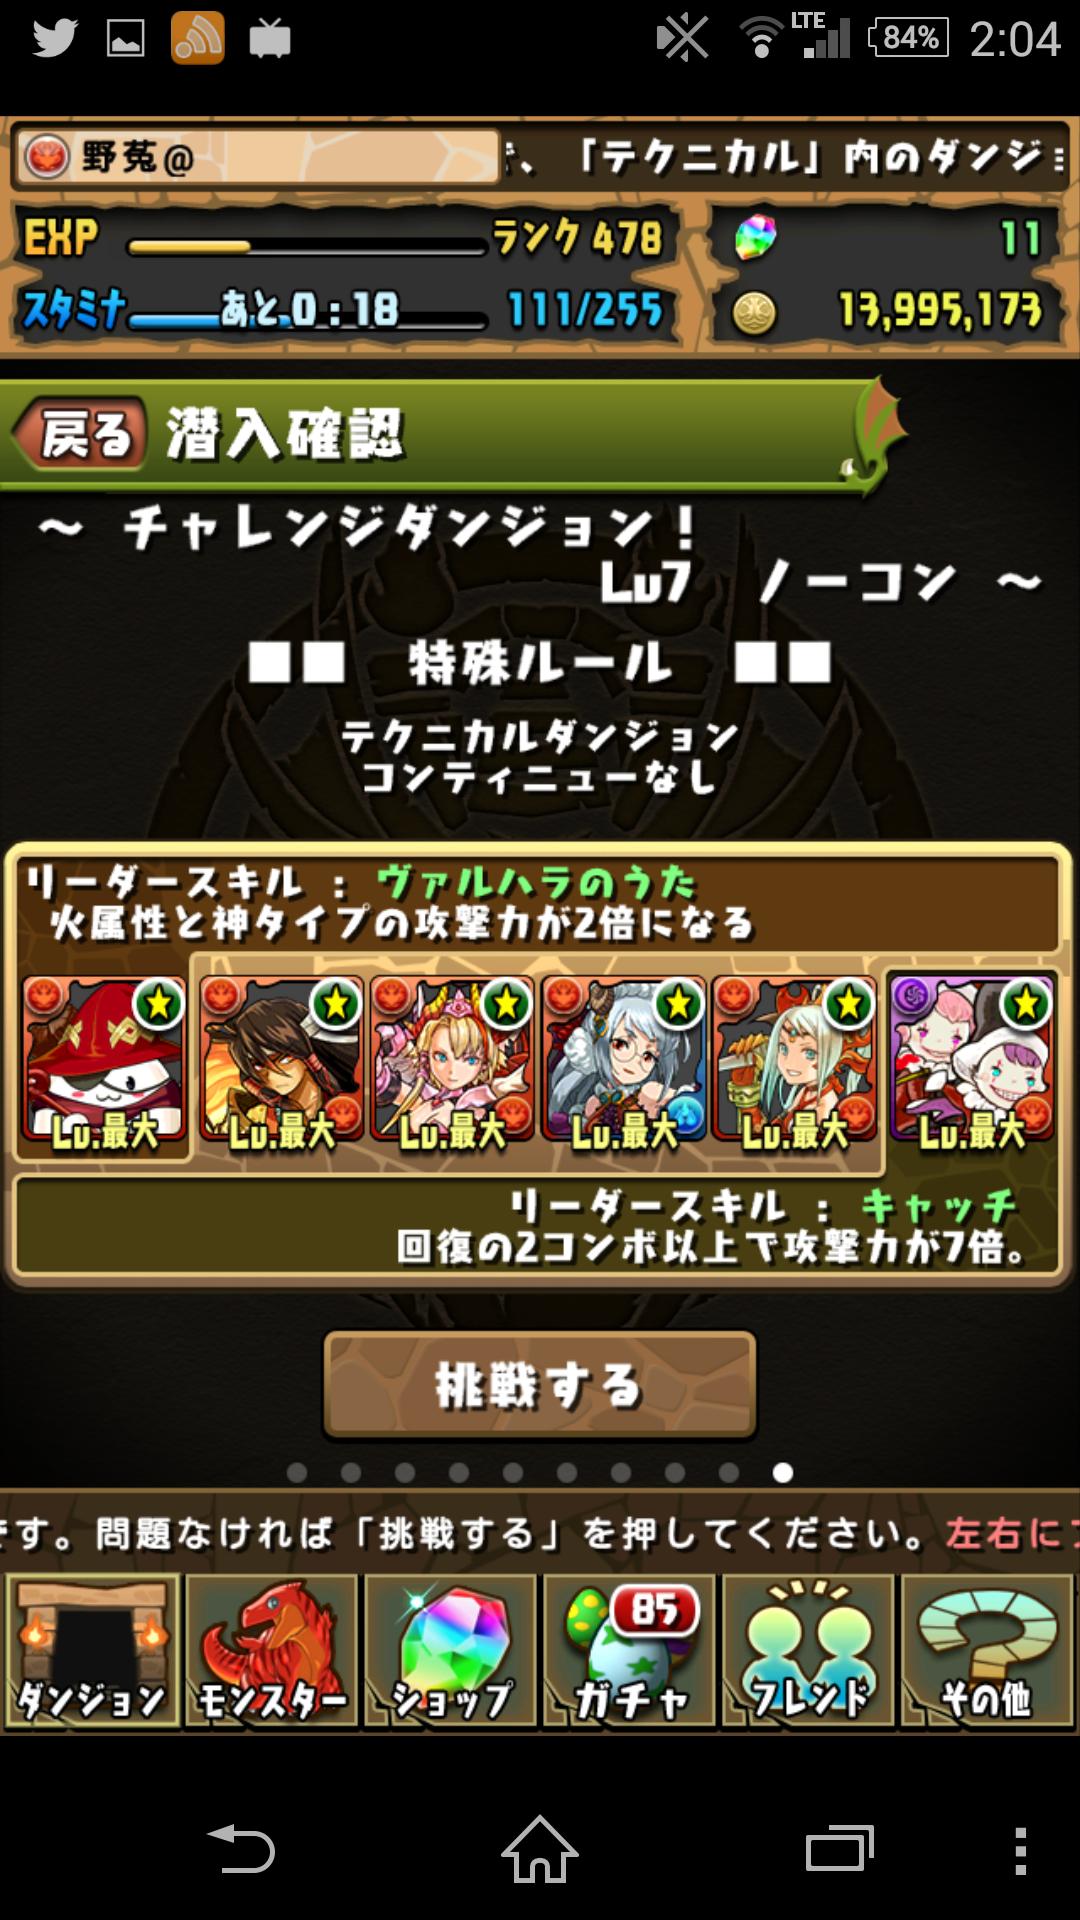 Screenshot_2015-03-12-02-04-47.png